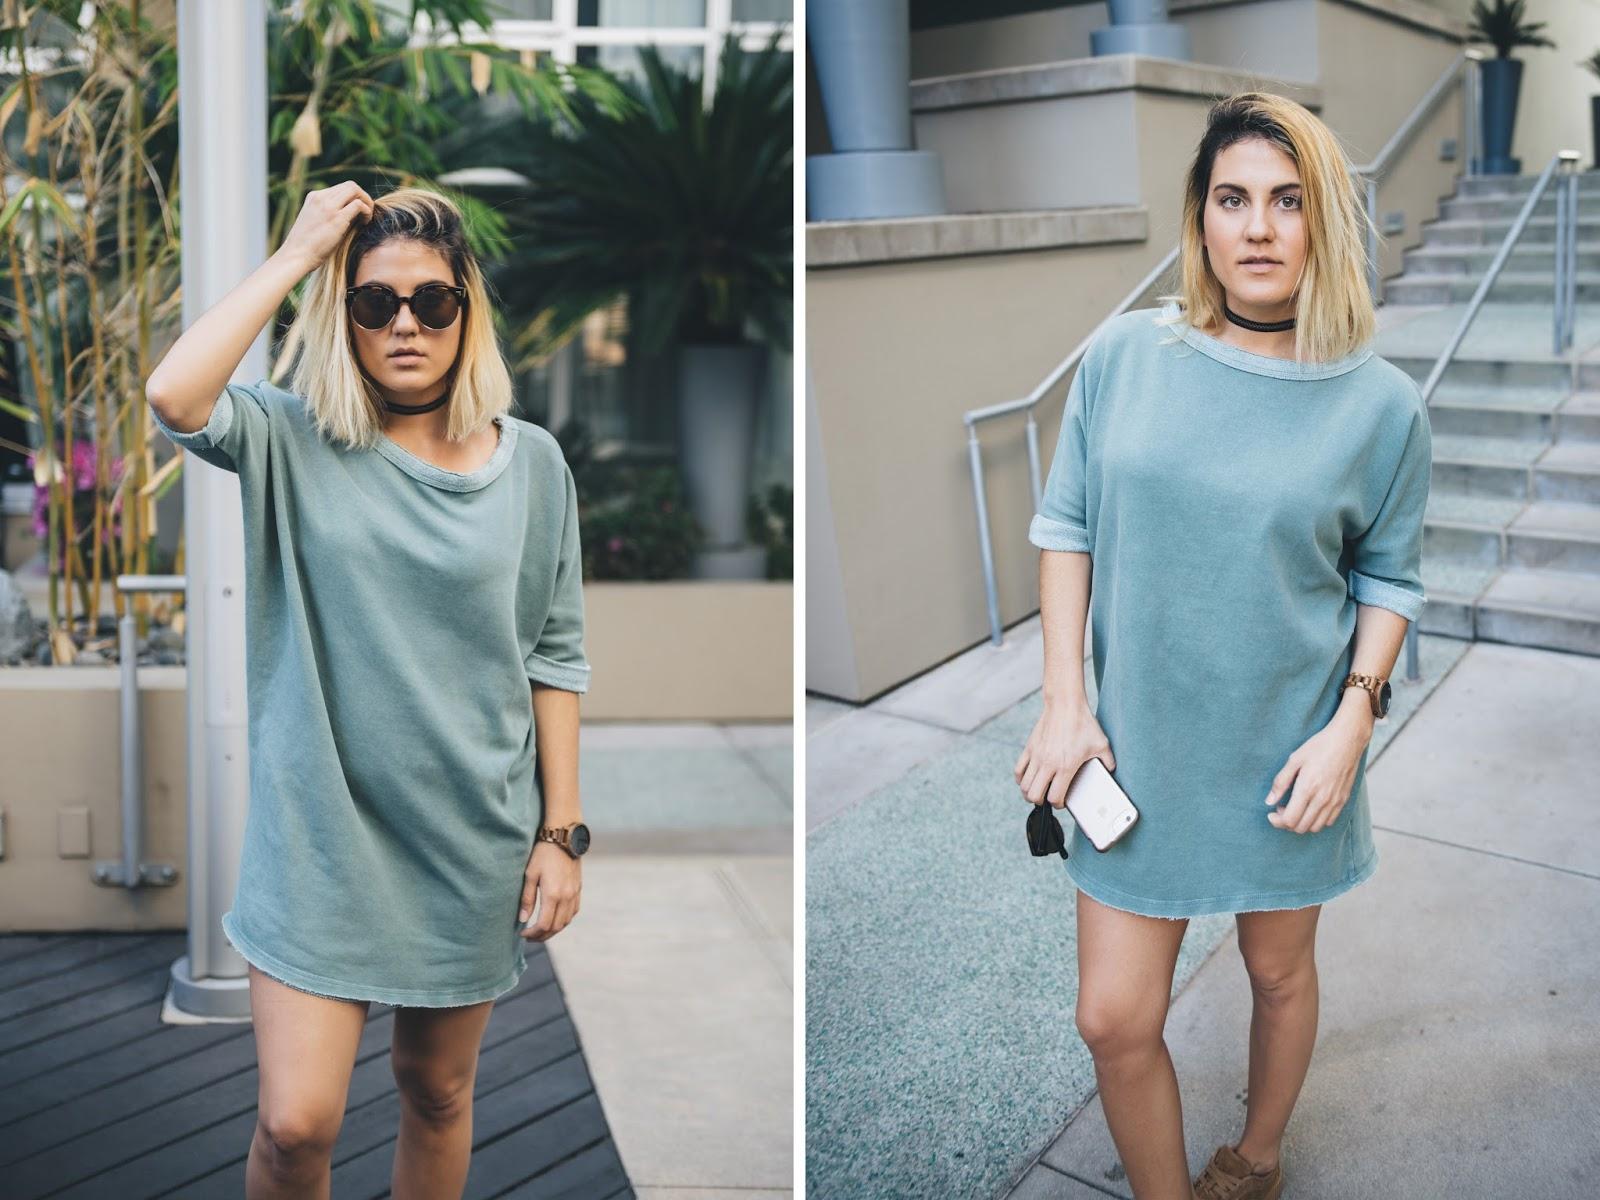 Urban Outfitters Casual Sweater Dress - @taylorwinkelmeyer